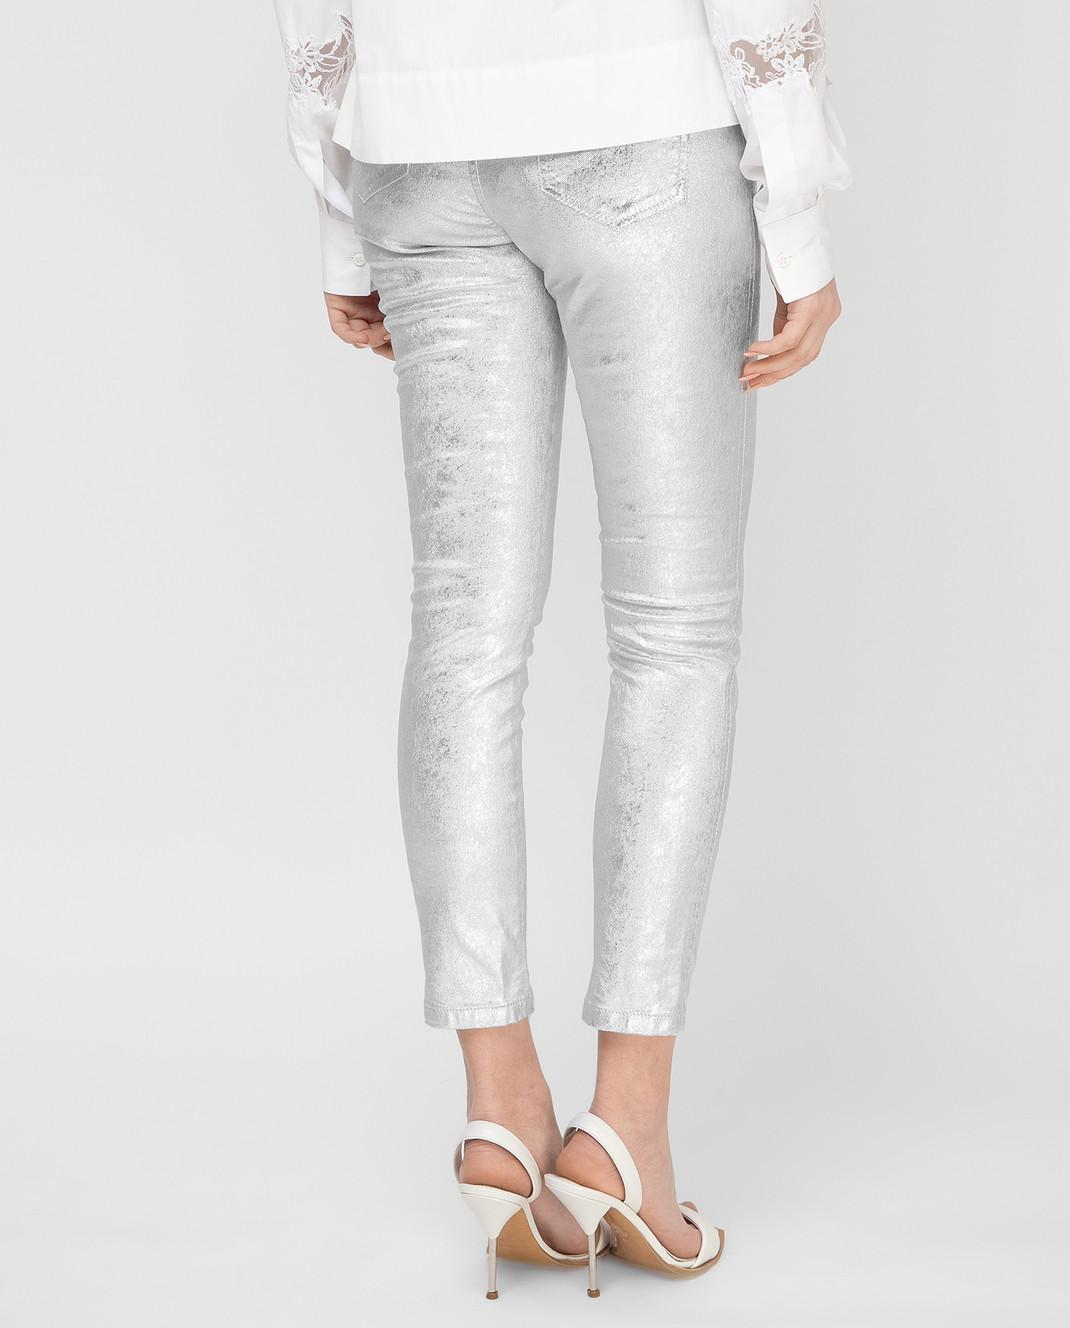 Ermanno Scervino Серебристые джинсы D347P700XFW изображение 4